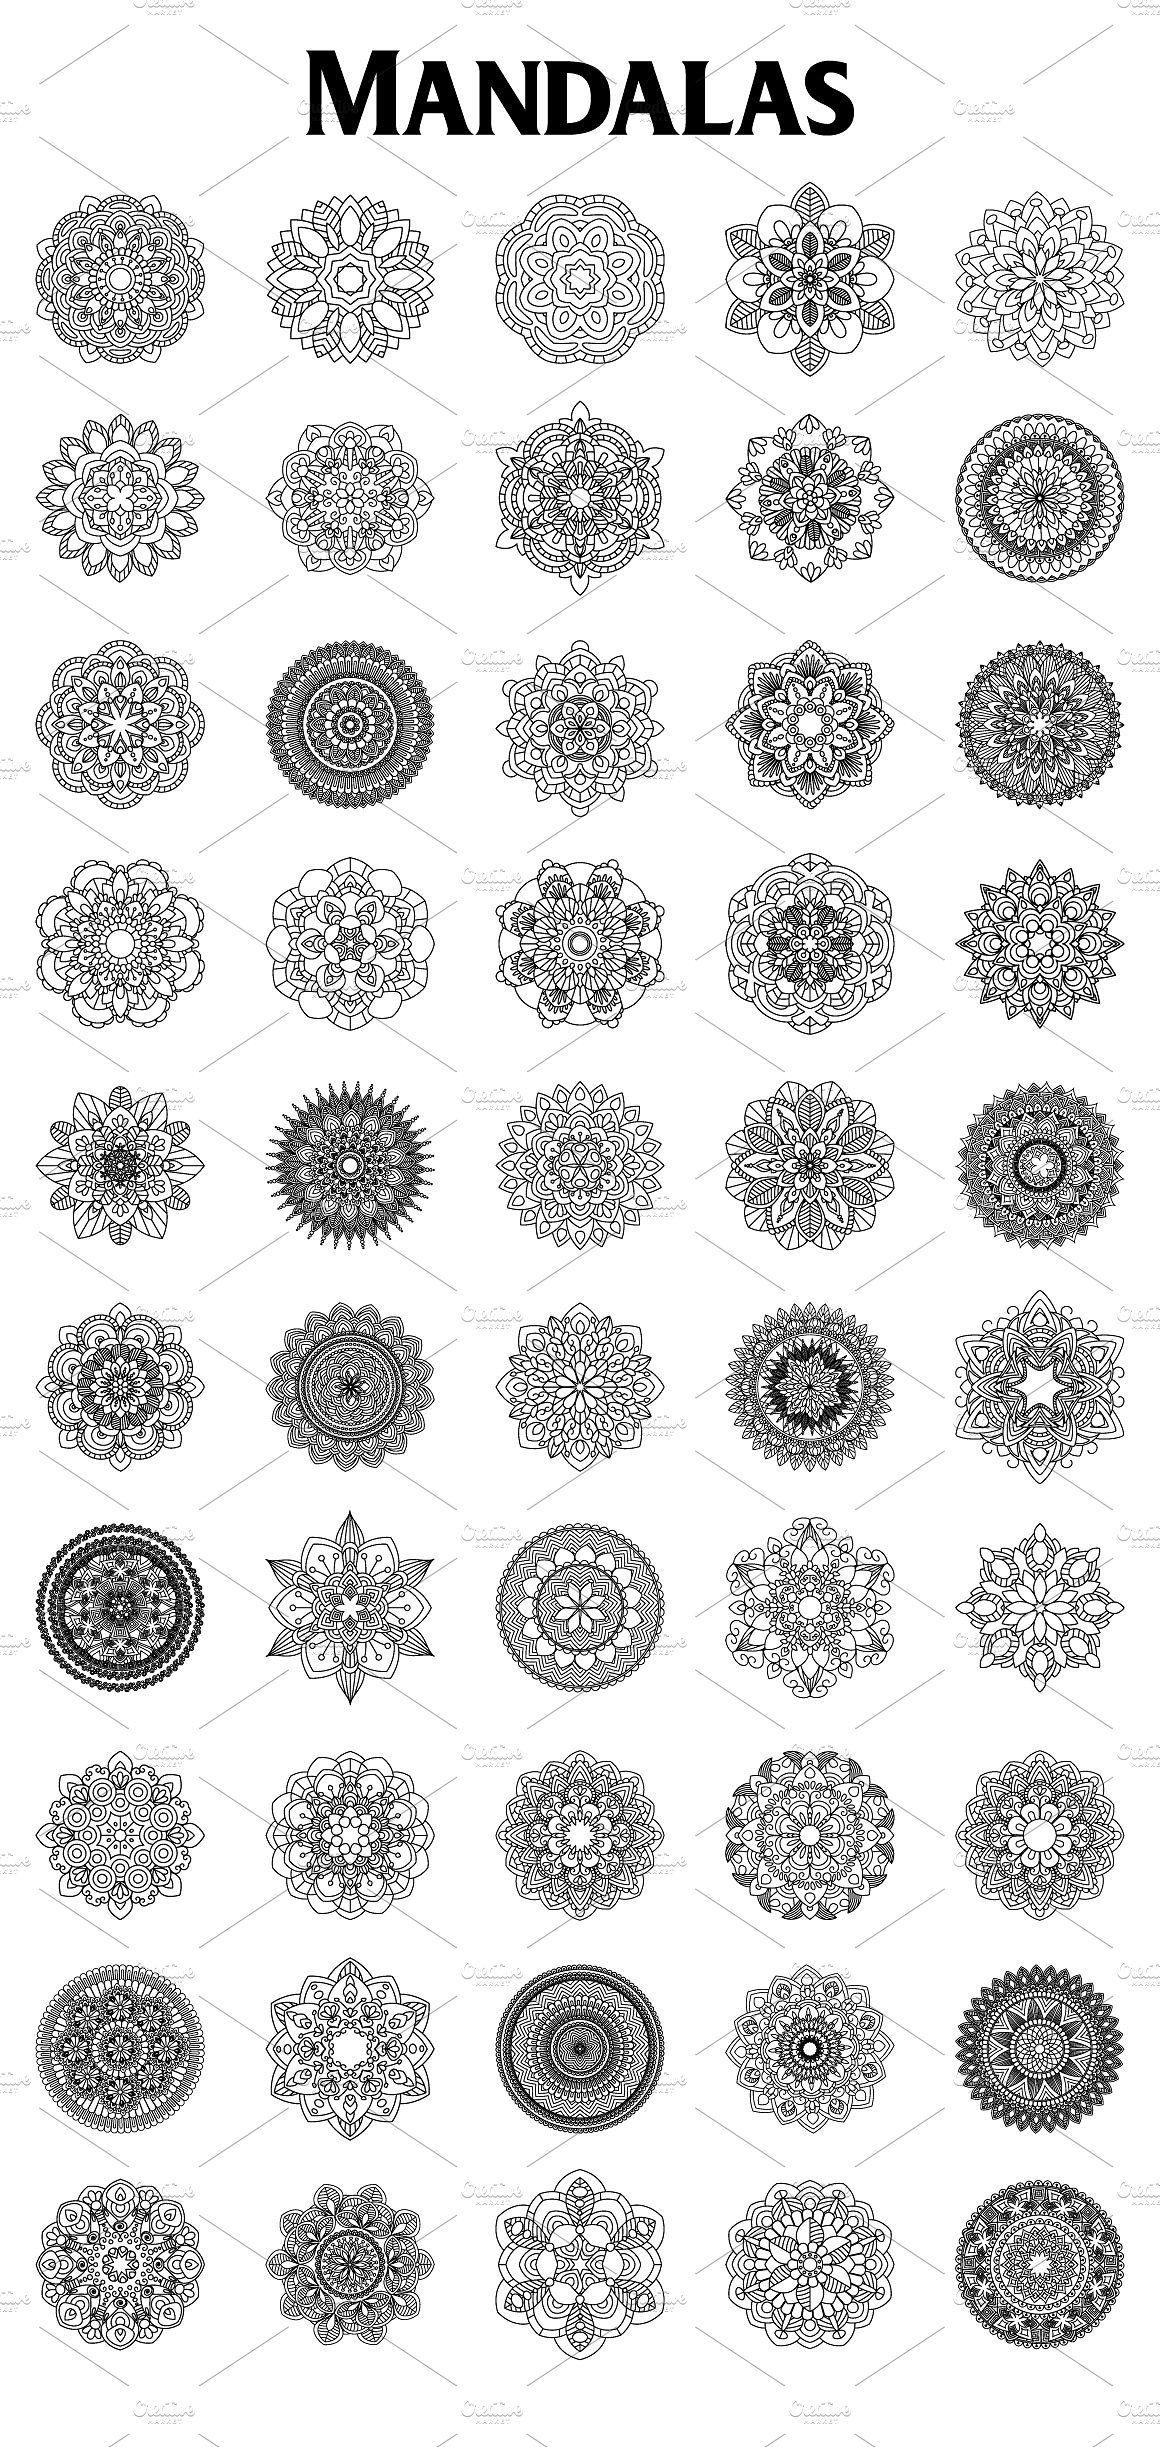 50 Mandalas By Elinorka On Creativemarket